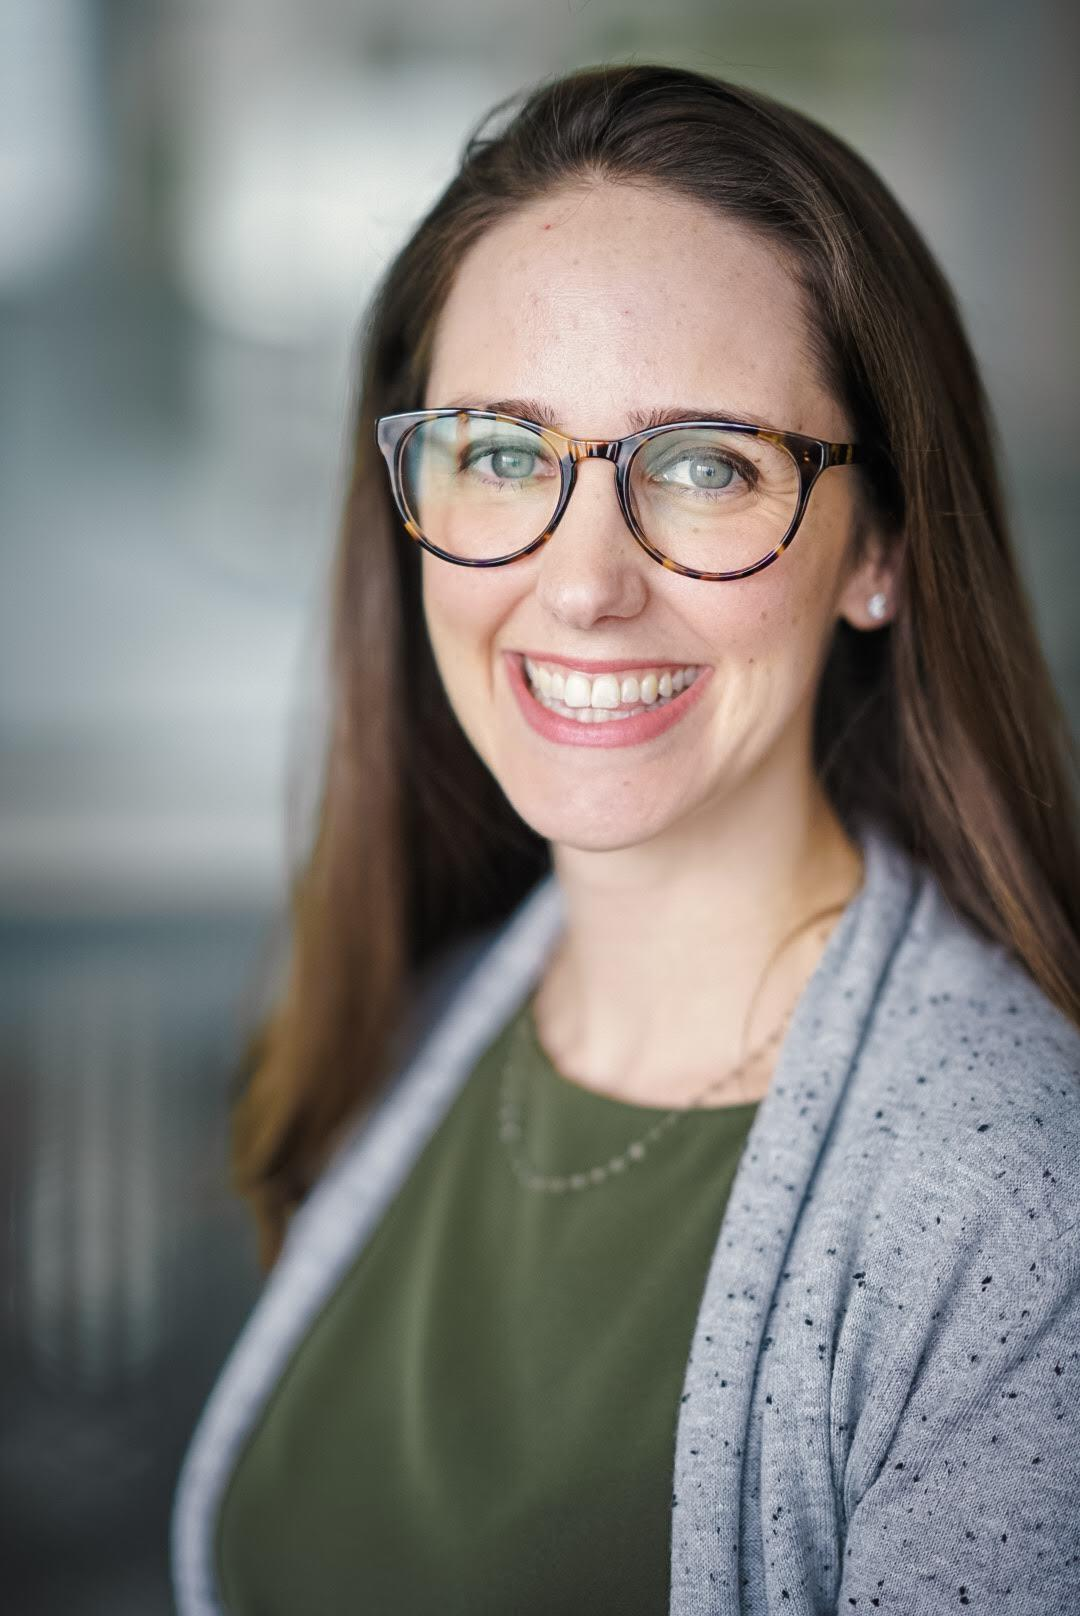 Jessica Macken Portrait Photo